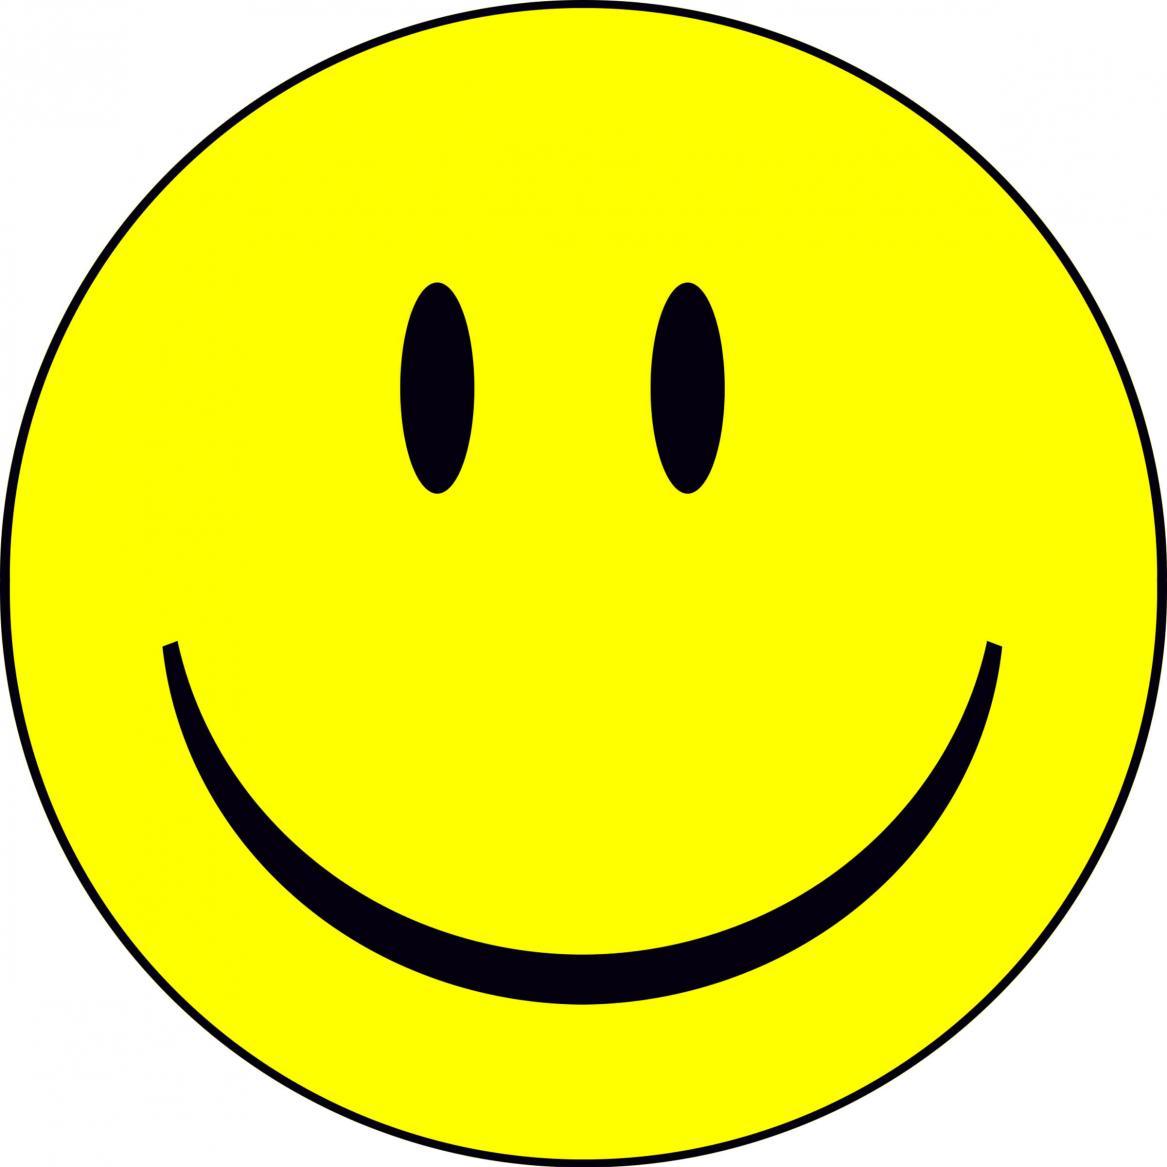 Smiley Face Clip Art Emotions-smiley face clip art emotions-11